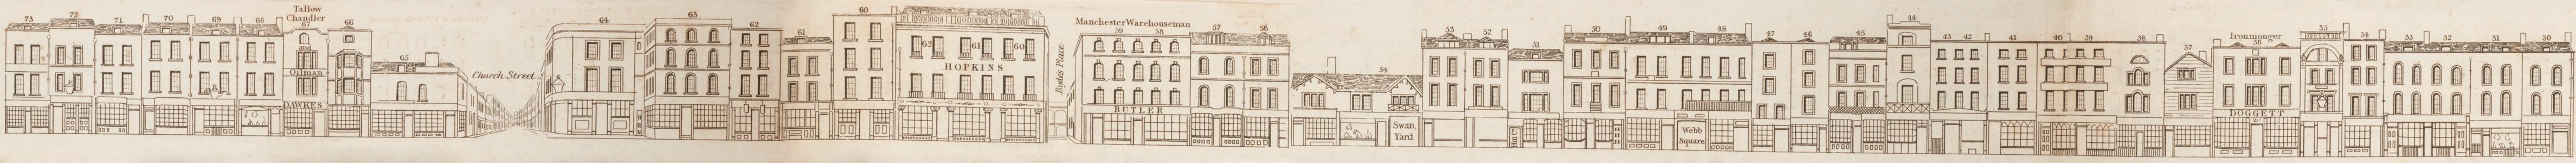 map - Tallis's London street views : No. 59. Shoreditch, division 2 (east)